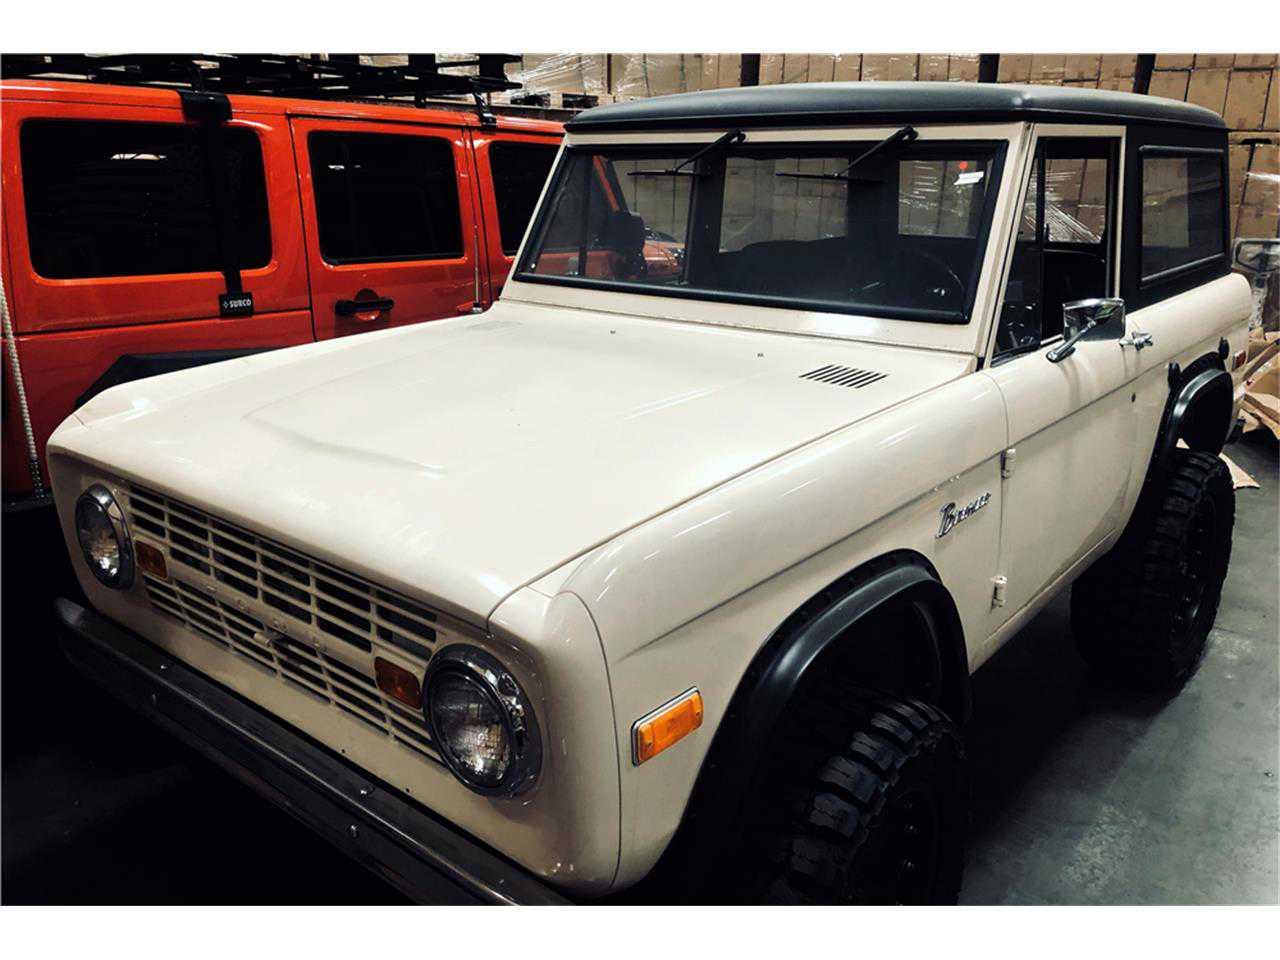 1971 Ford Bronco For Sale In U15gll40144 Interior